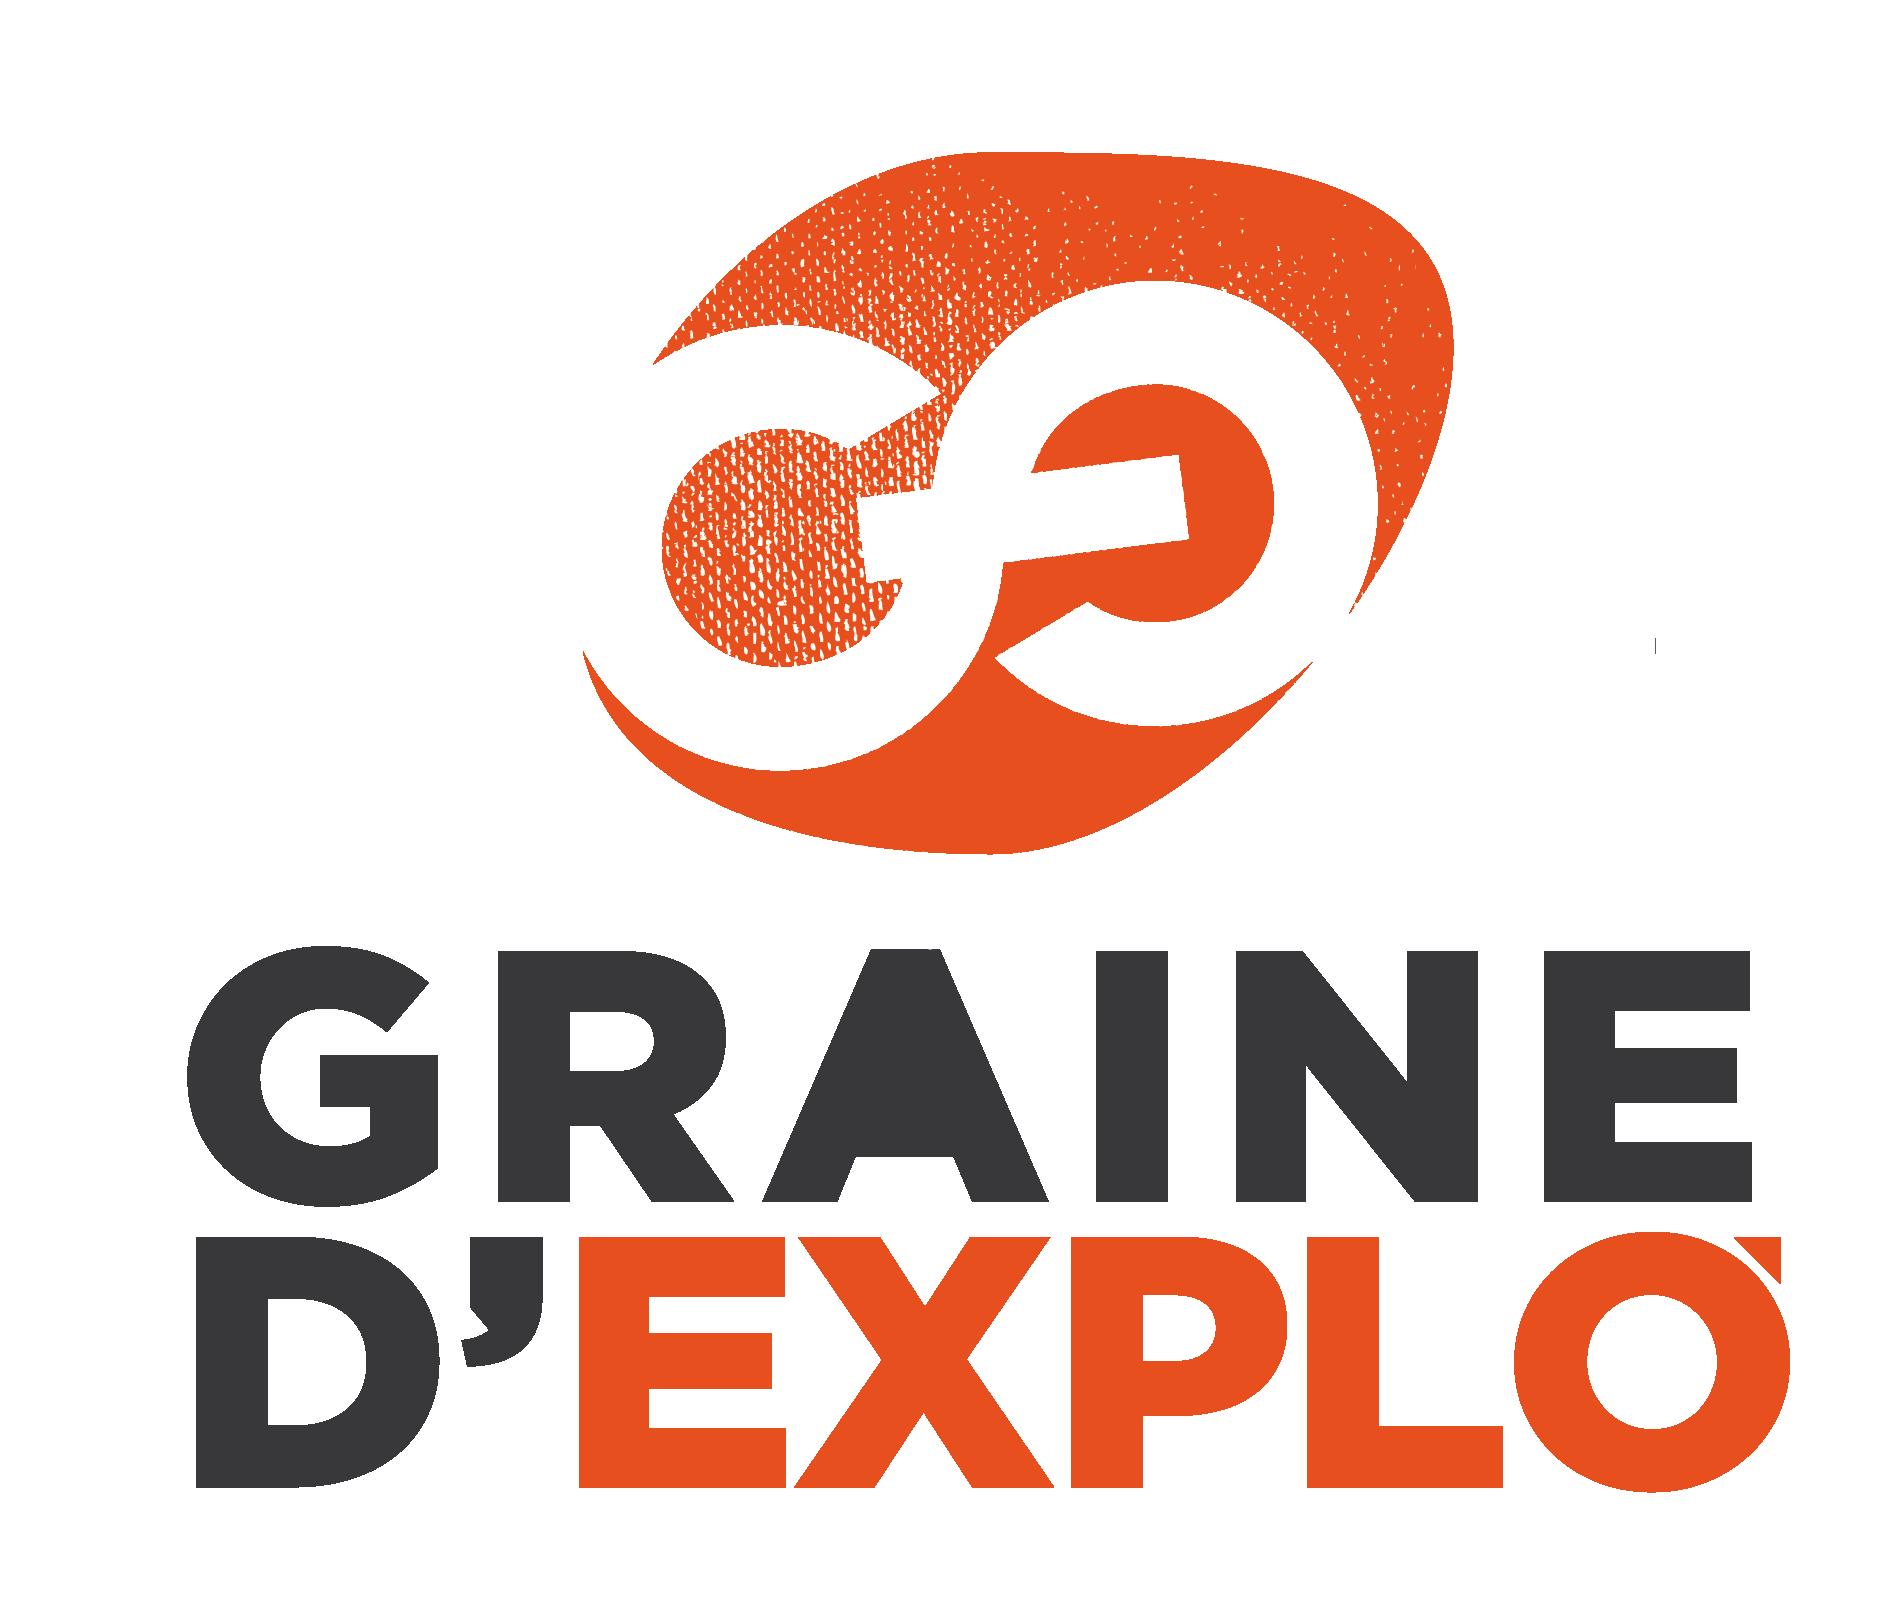 Graine d'explo